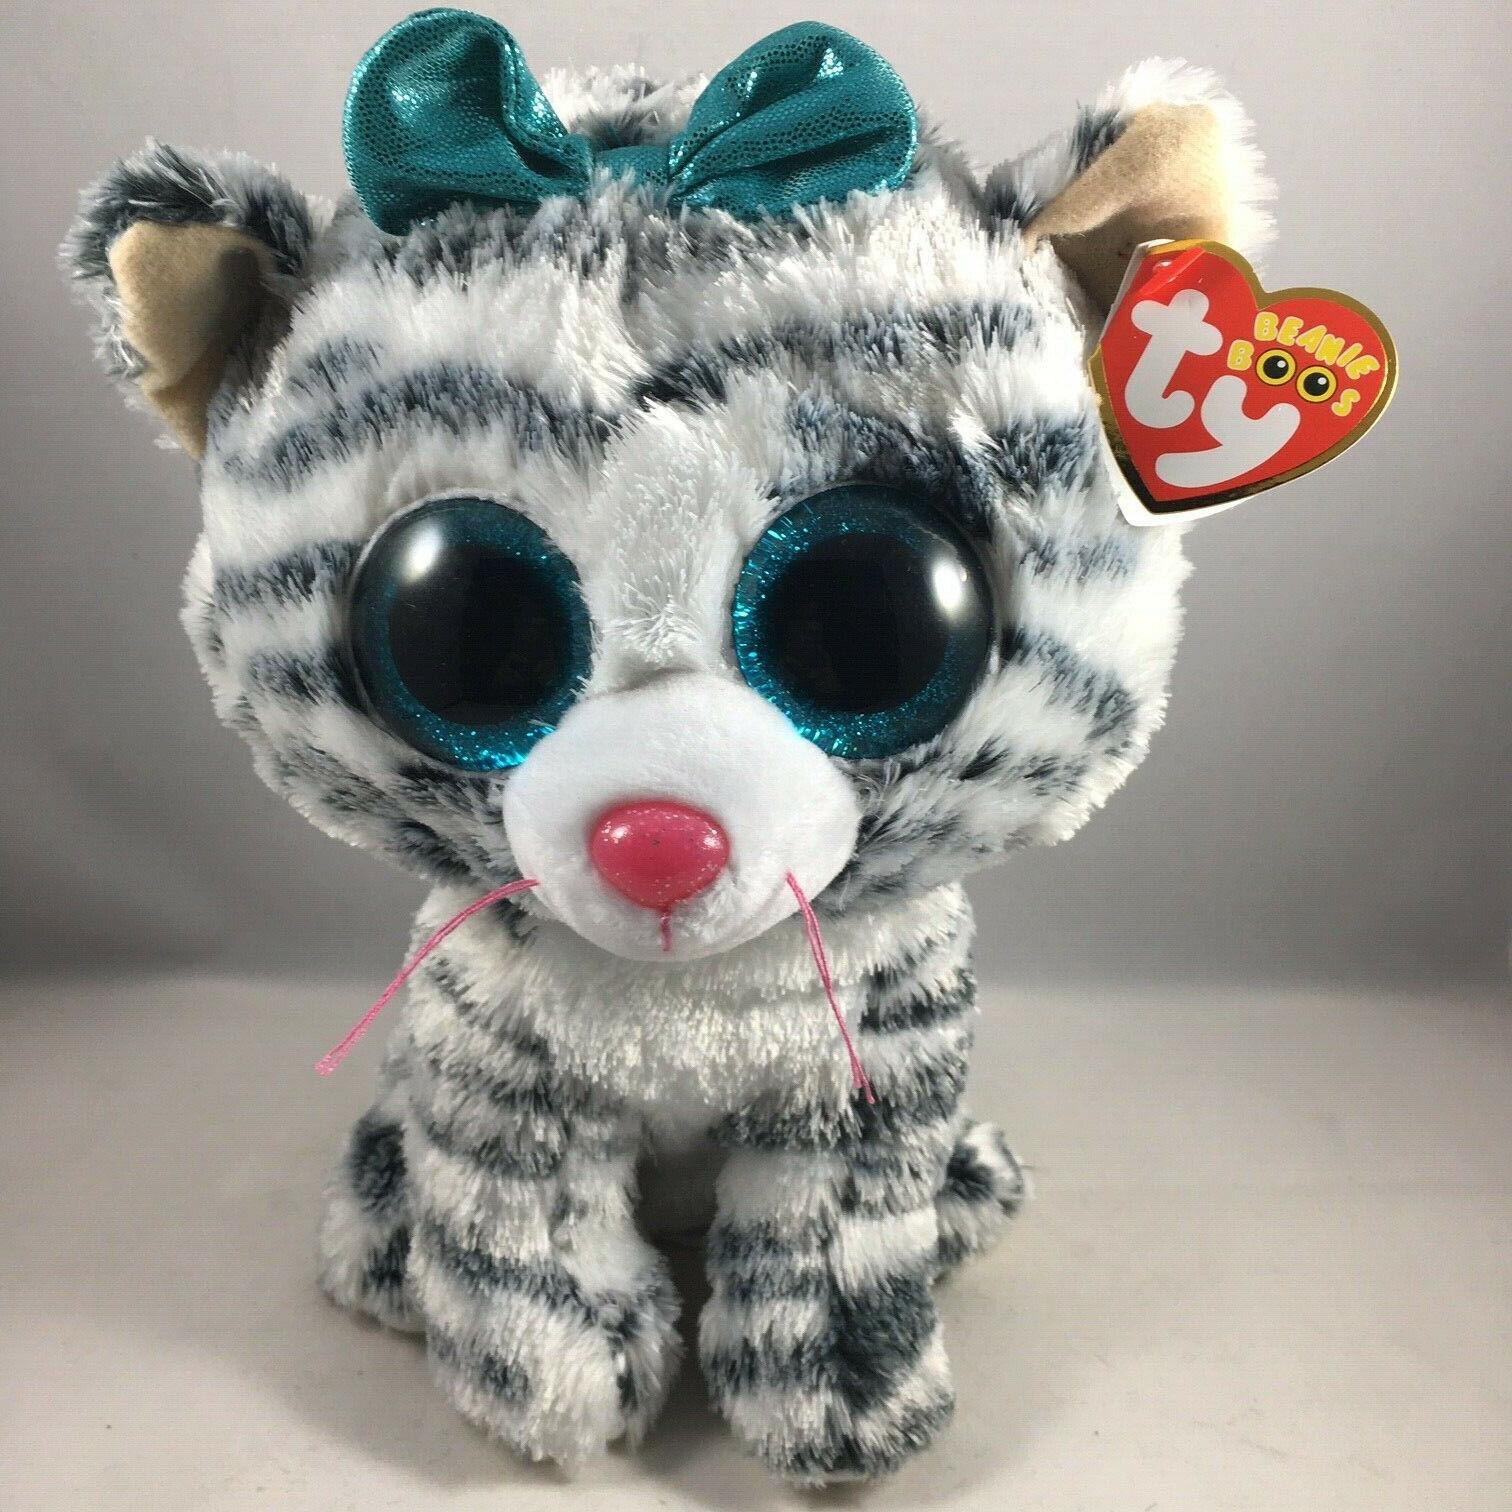 TY Beanie Boos Medium 9 inch - MWMTs Glitter Eyes TASHA the Leopard